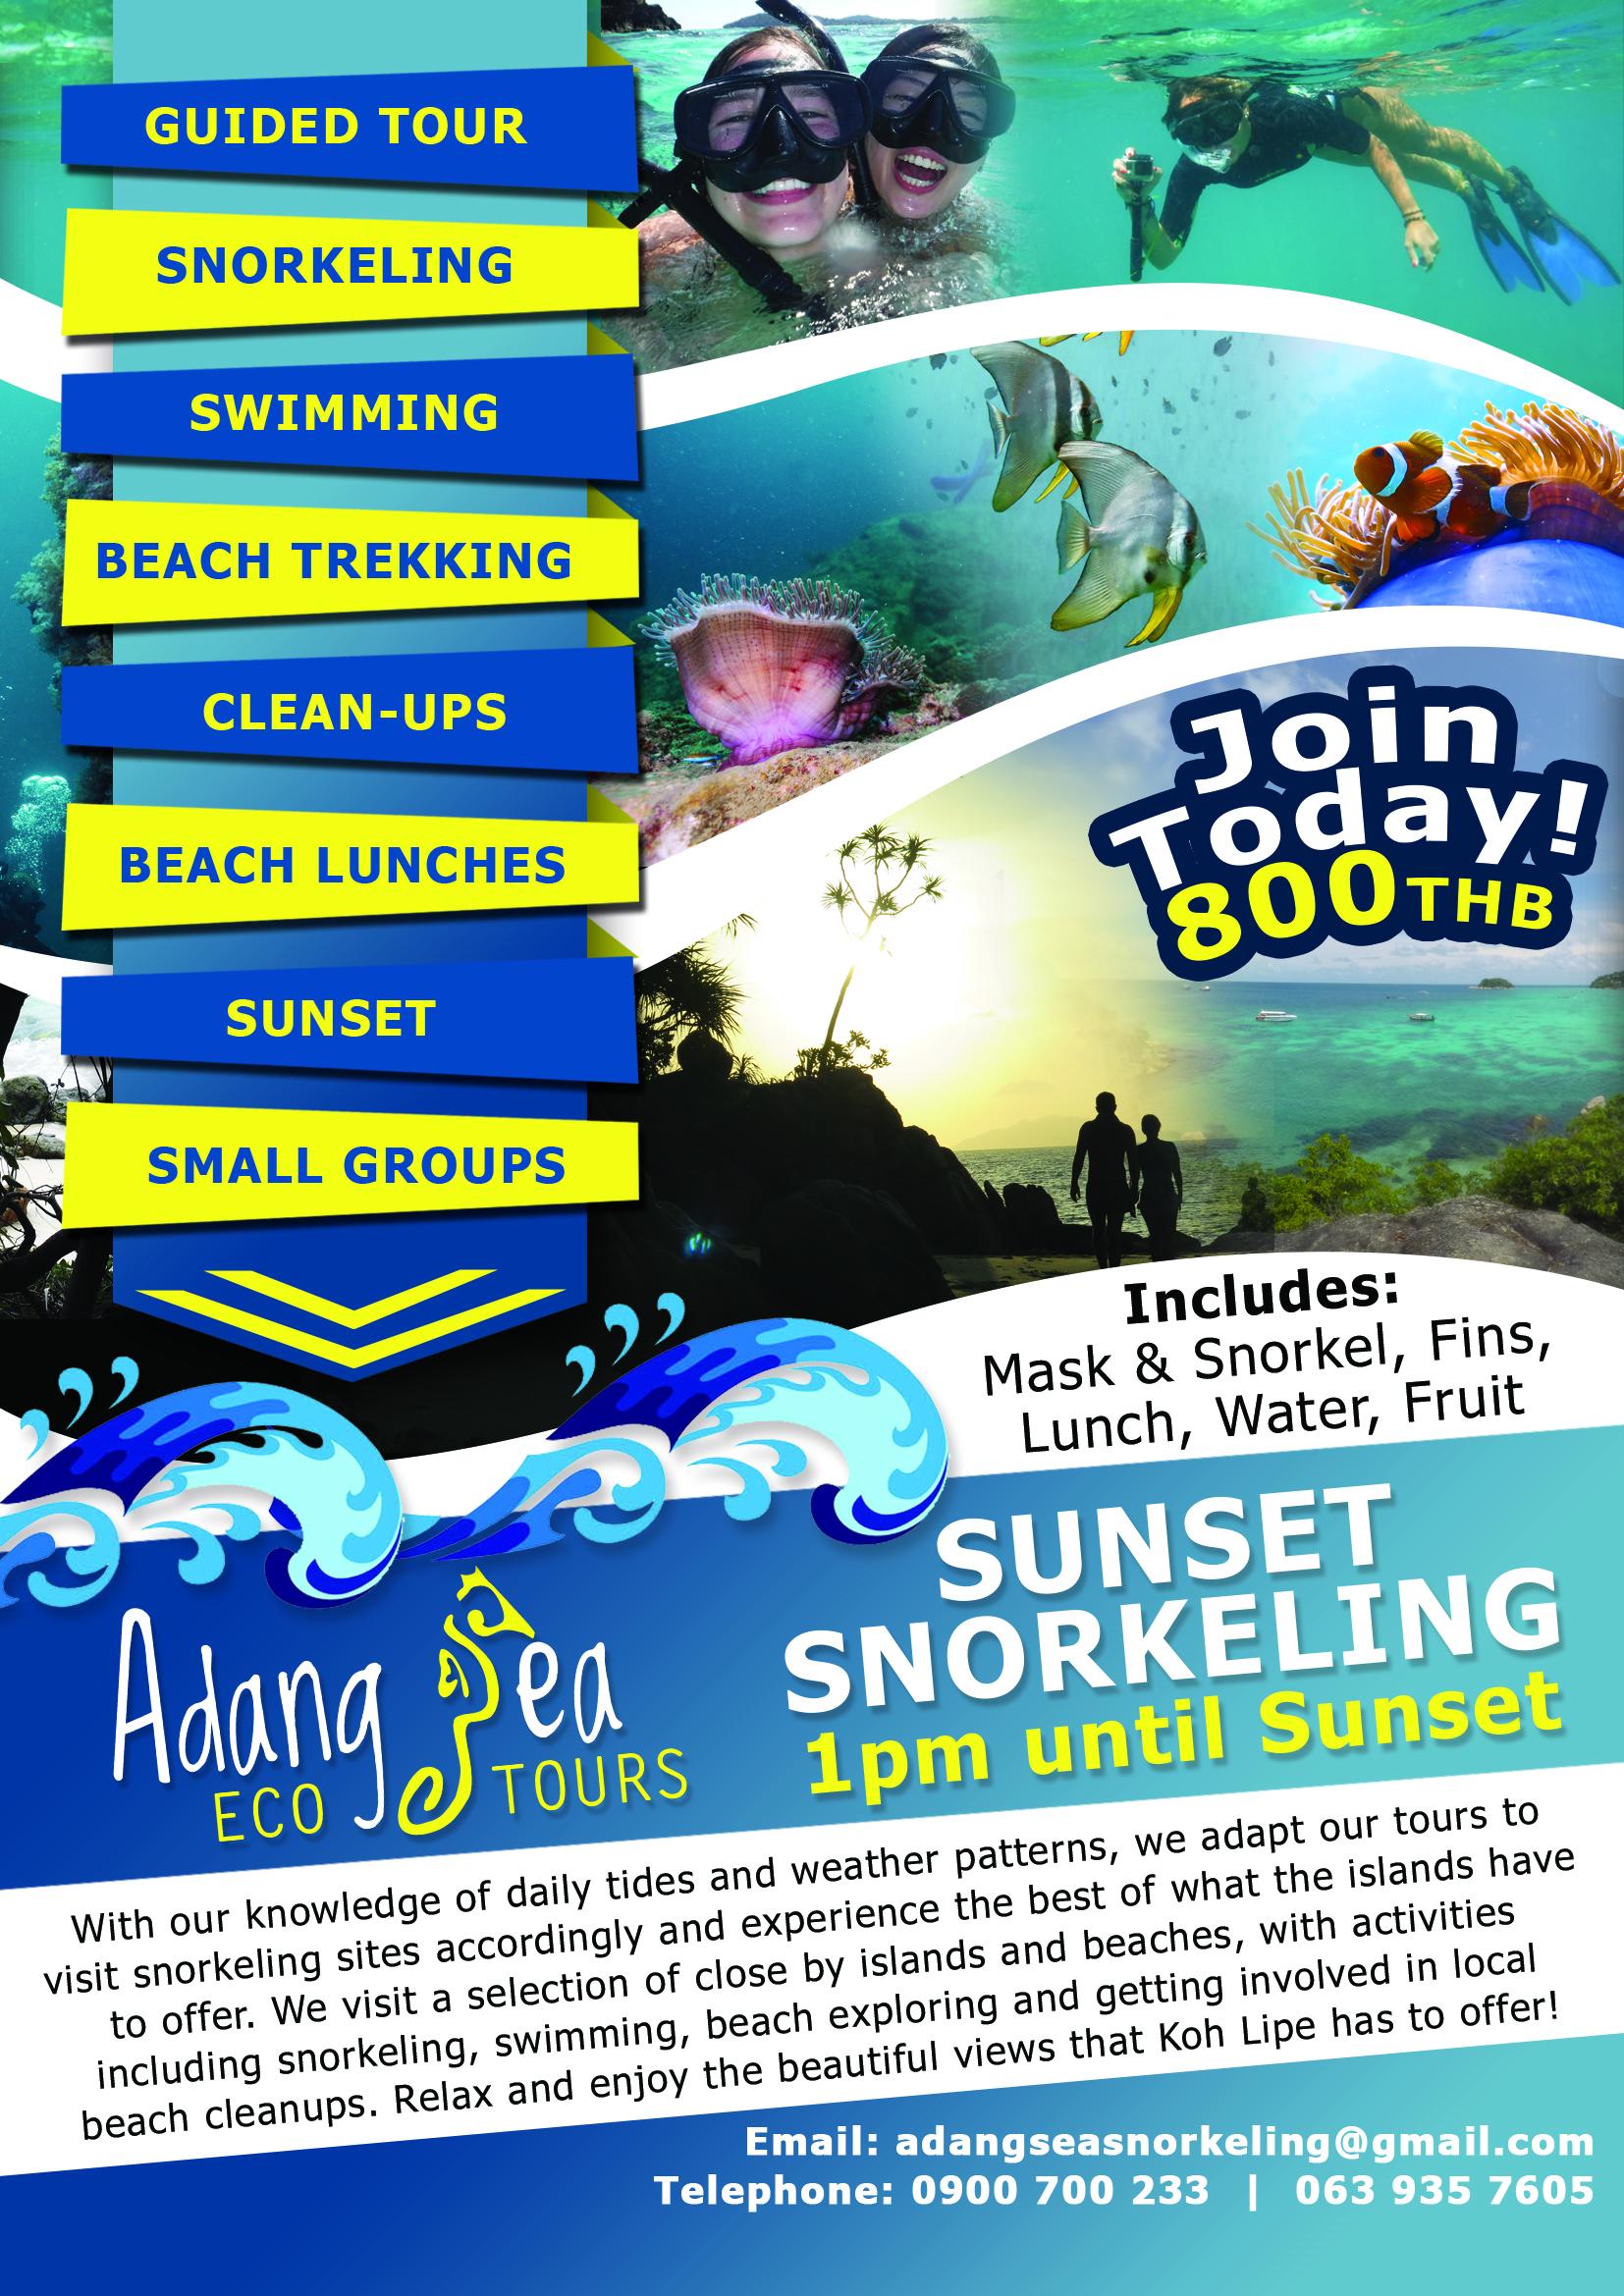 Adang Eco Tour